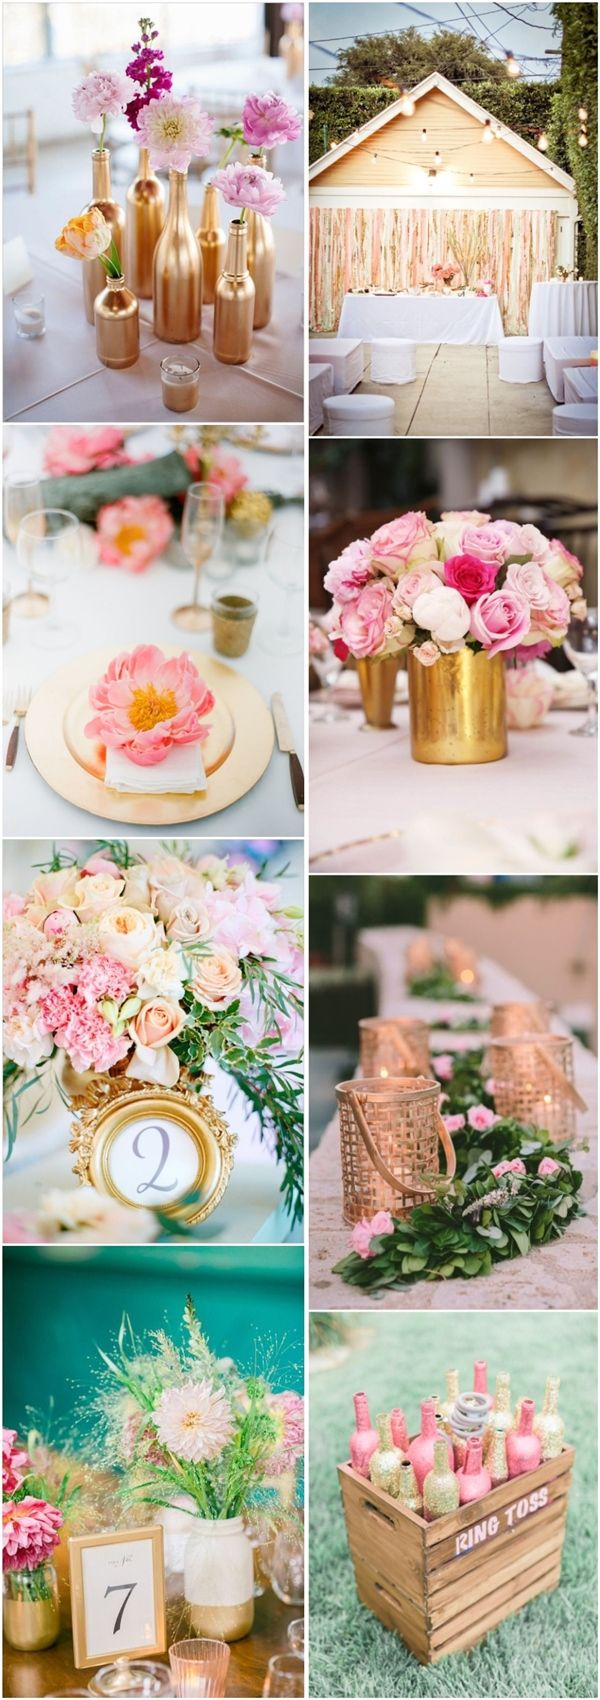 Best 25 gold weddings ideas on pinterest gold wedding 40 romantic pink and gold wedding color scheme ideas junglespirit Choice Image